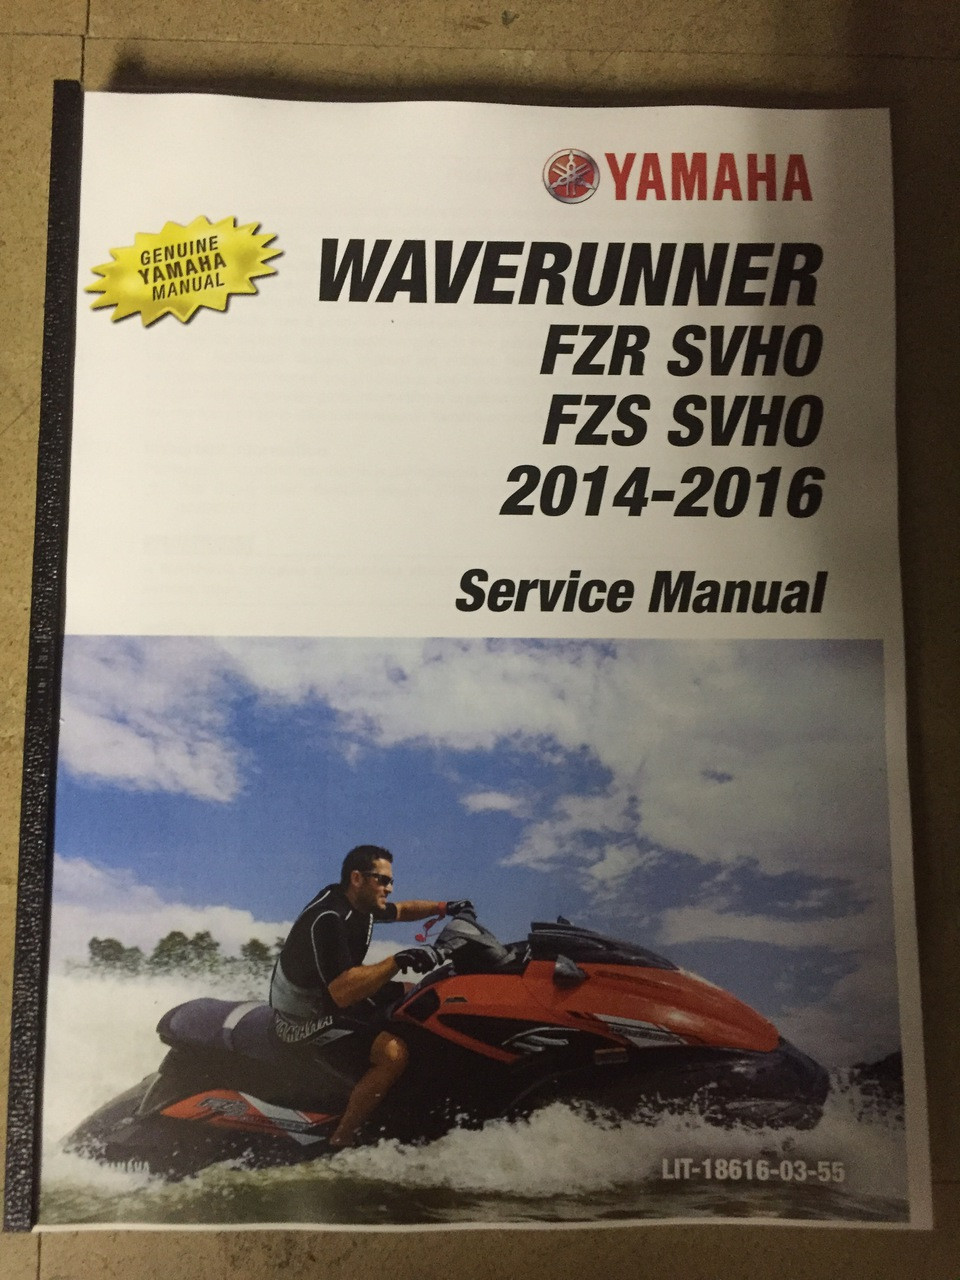 2014-2016 Yamaha WaveRunner FZR SVHO / FZS SVHO Part# LIT-18616-03-55  service shop repair manual